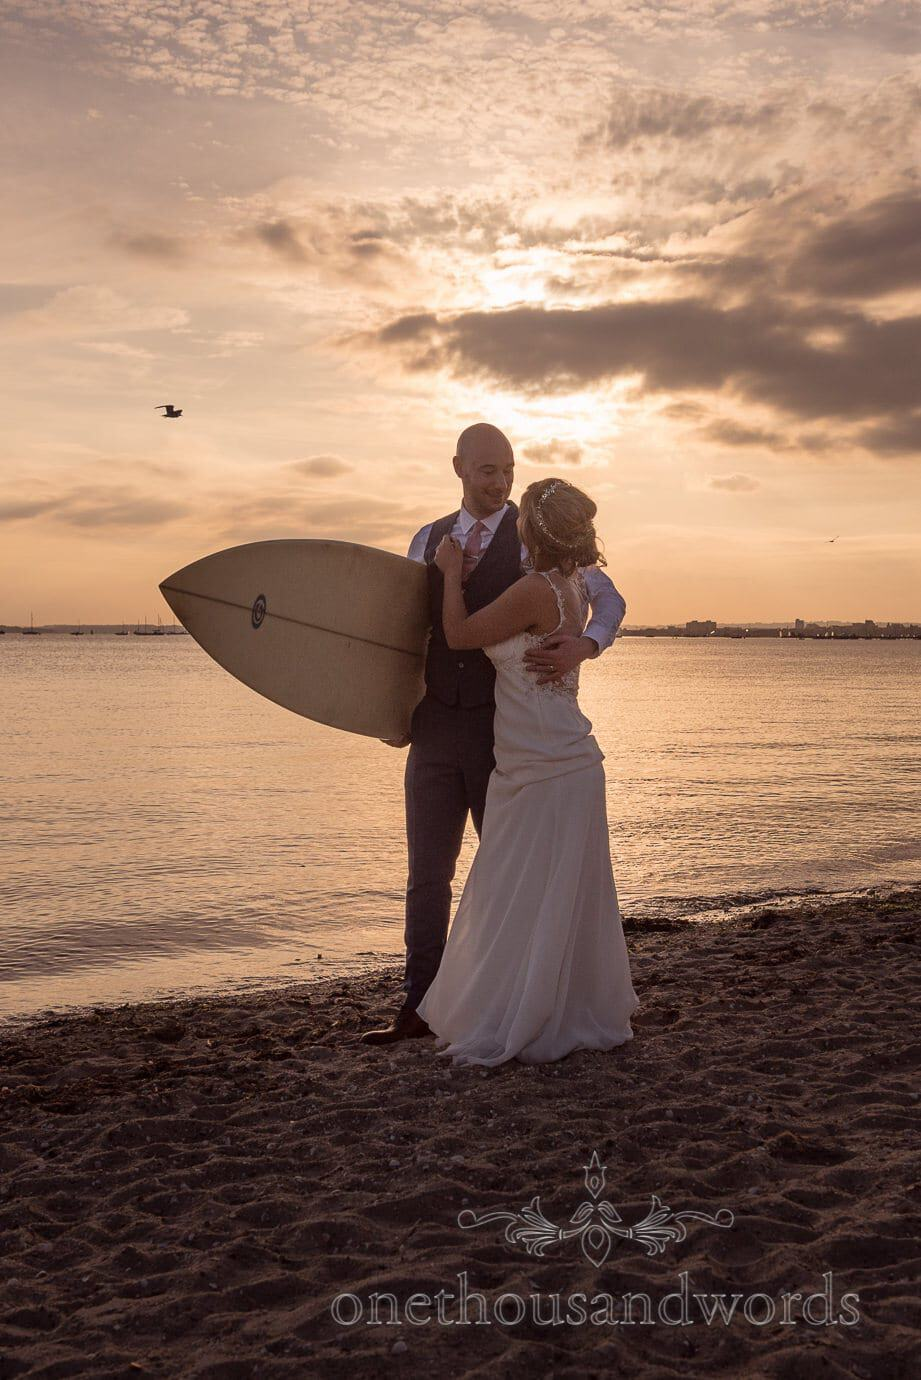 Newlyweds with surfboard from Italian Villa Wedding Photographs